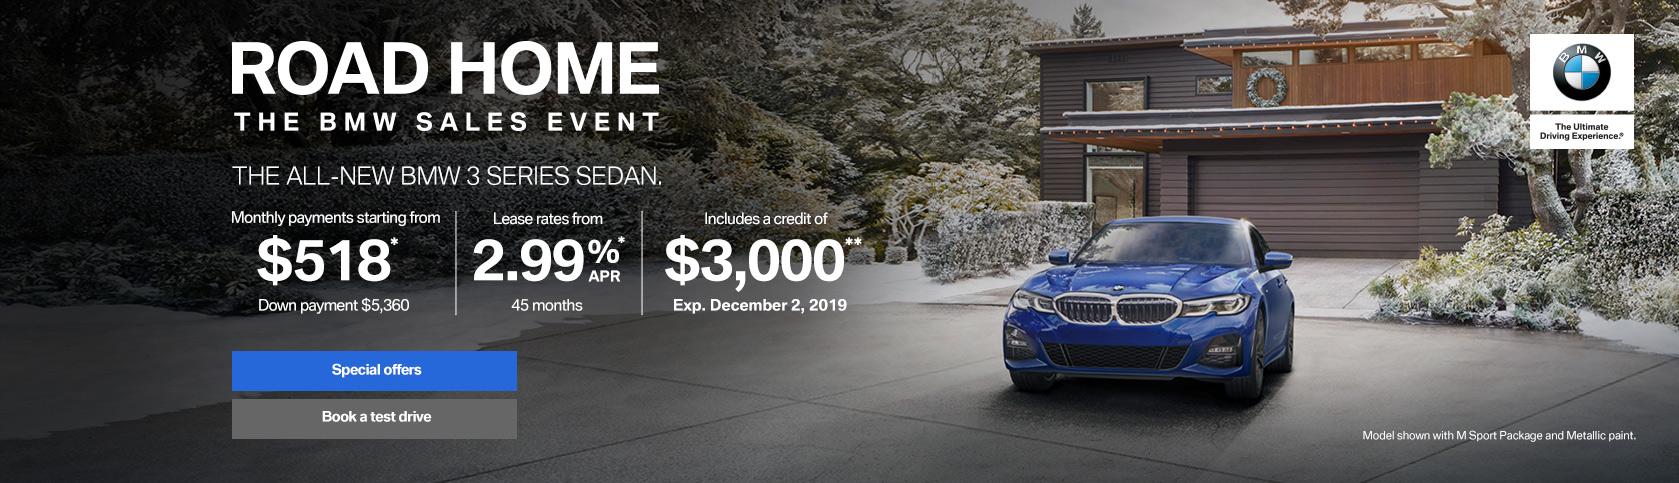 2019_BMW_NovDAG_3ser_Banner_1679x483_GTA